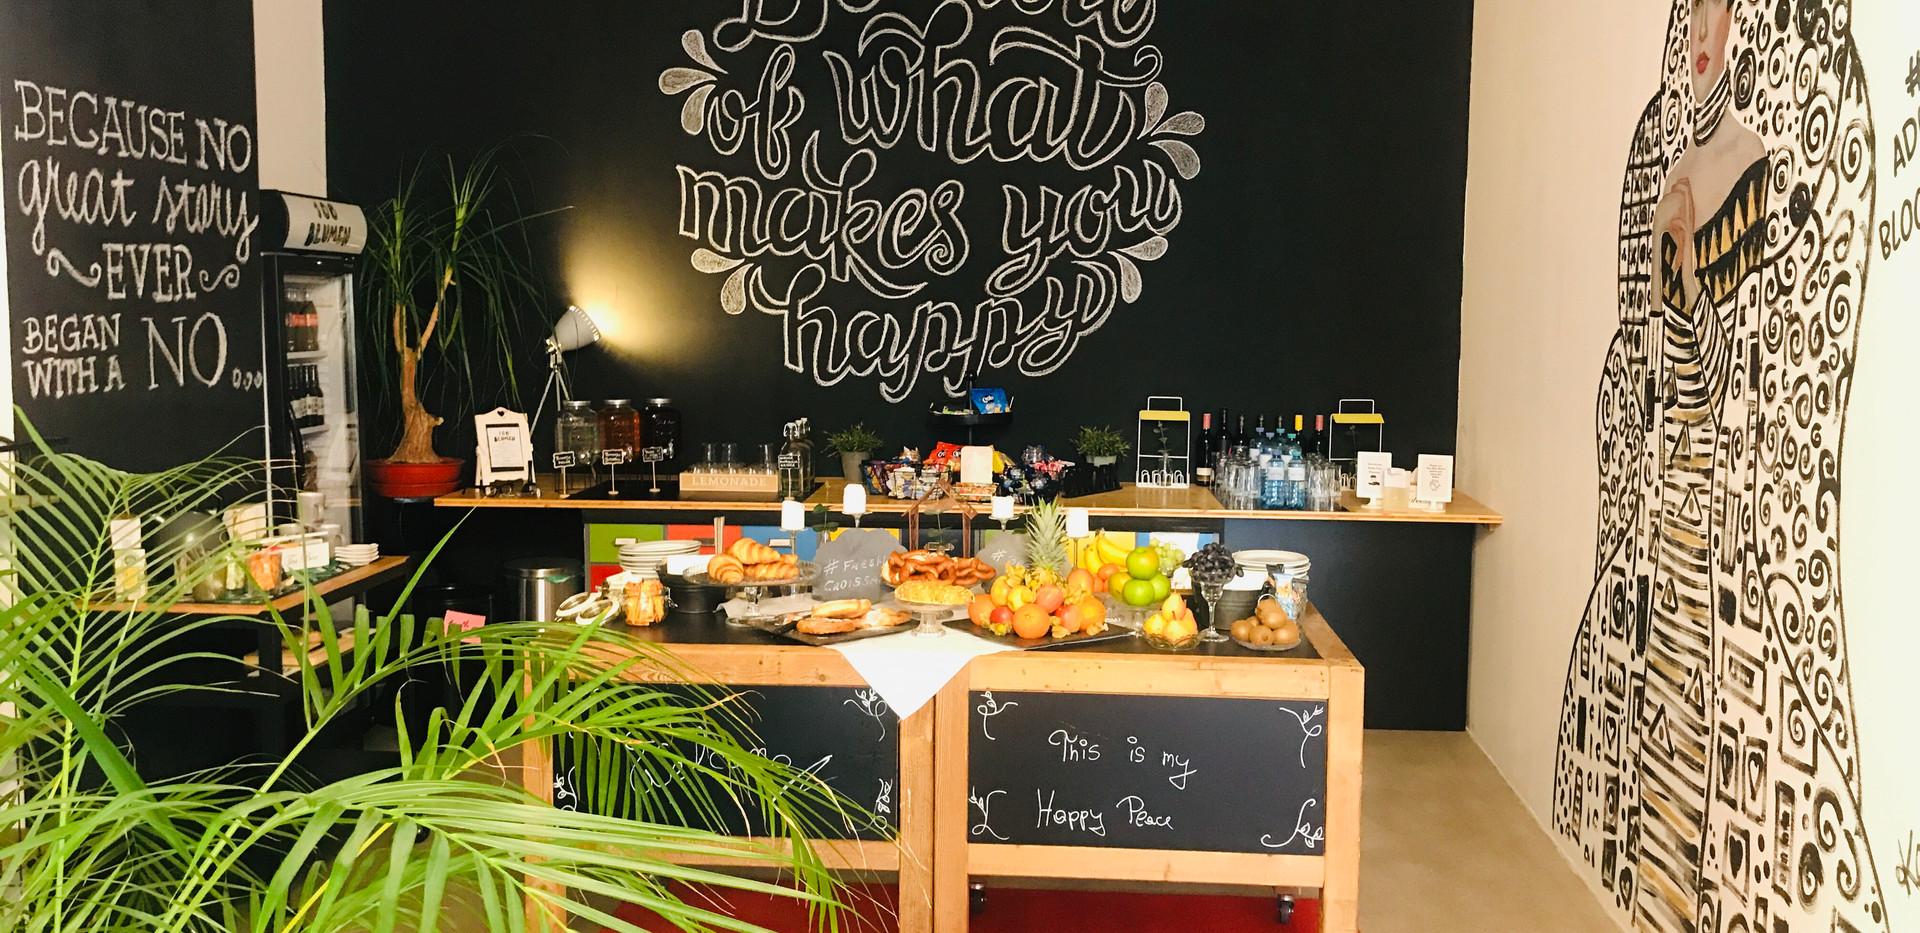 Food Court at Seminarloft Hauptbahnhof